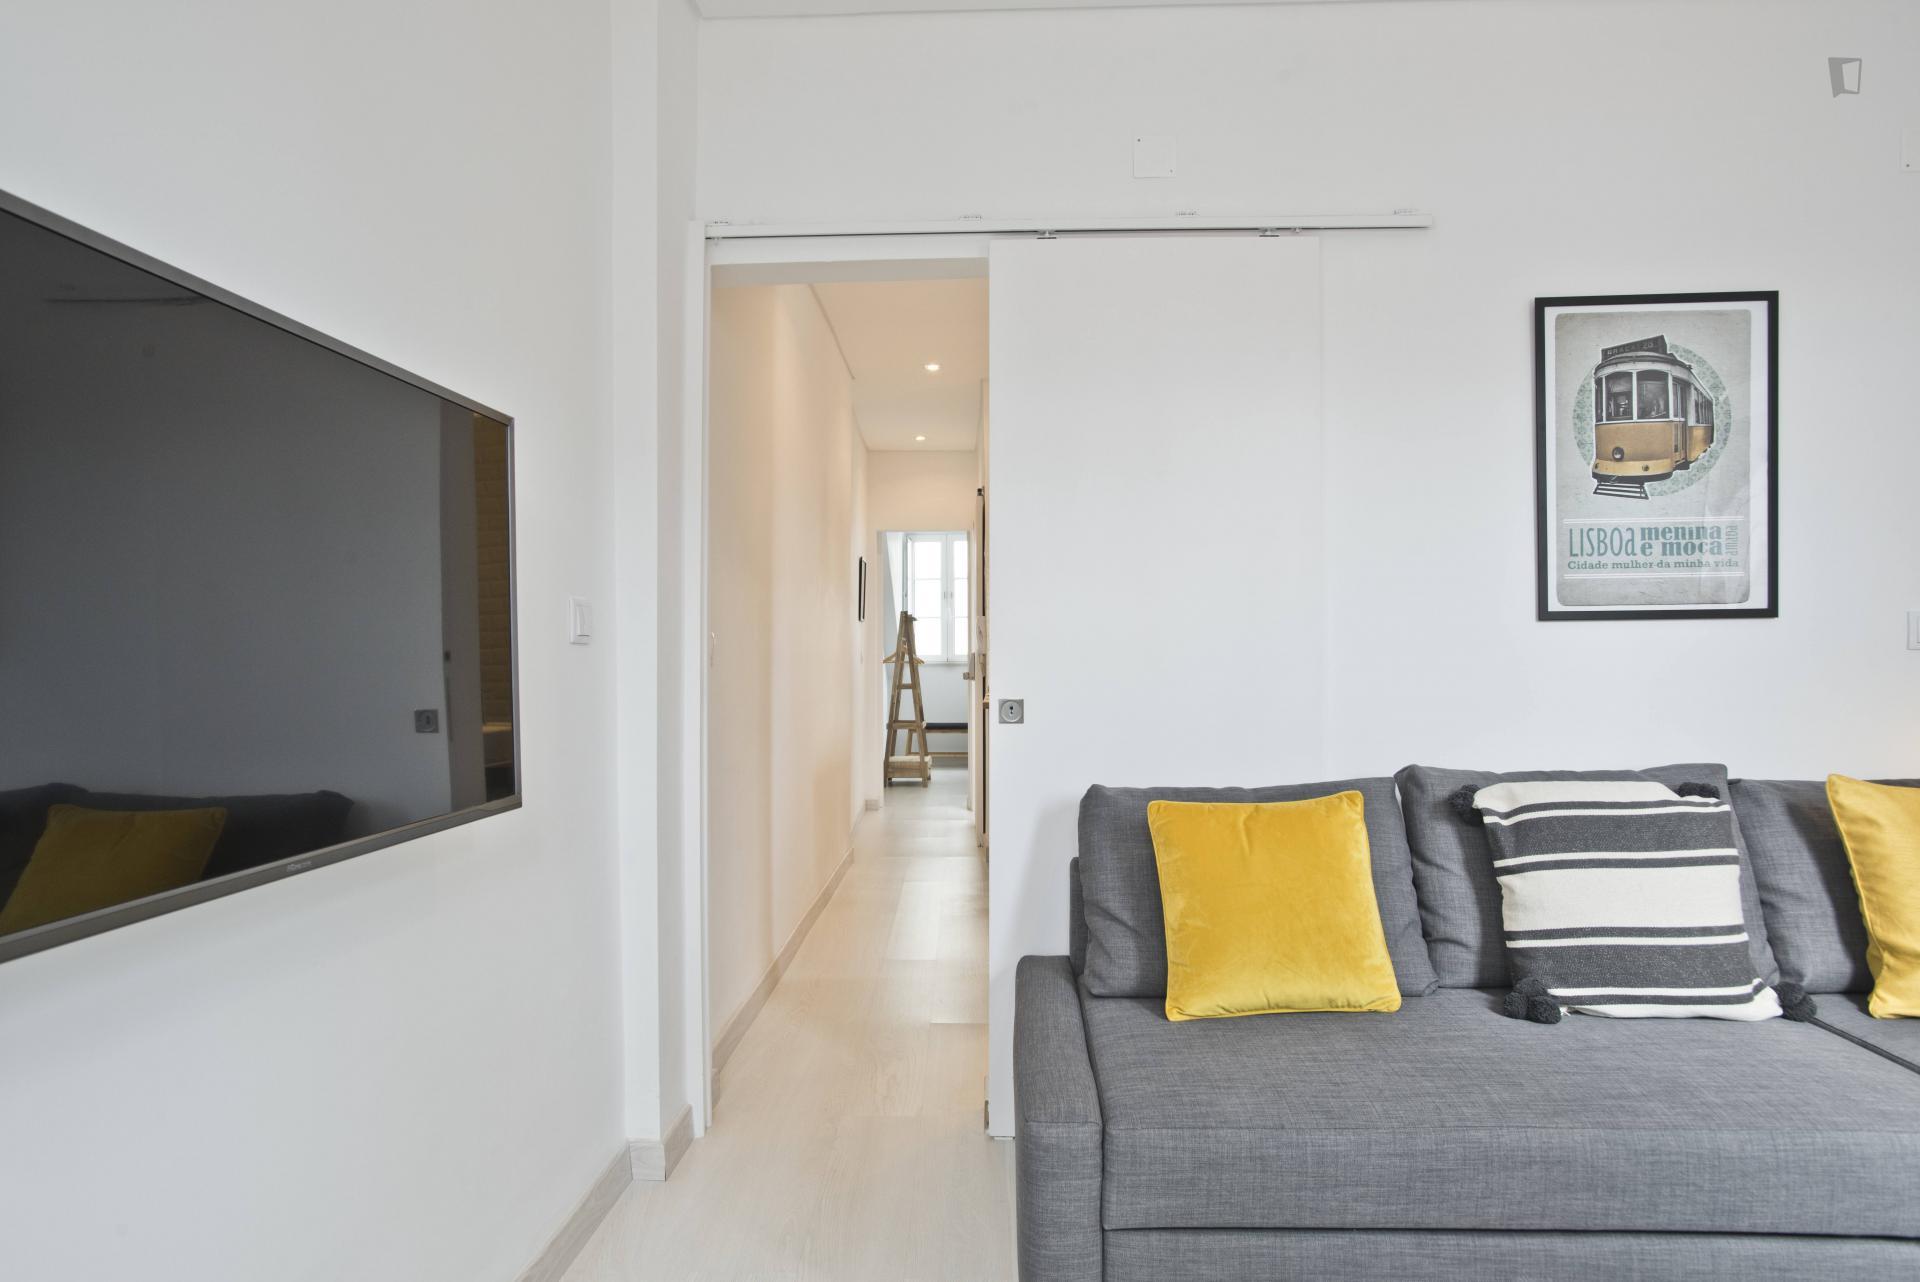 Almada- Up Scale 1 bedroom apartment Lisbon